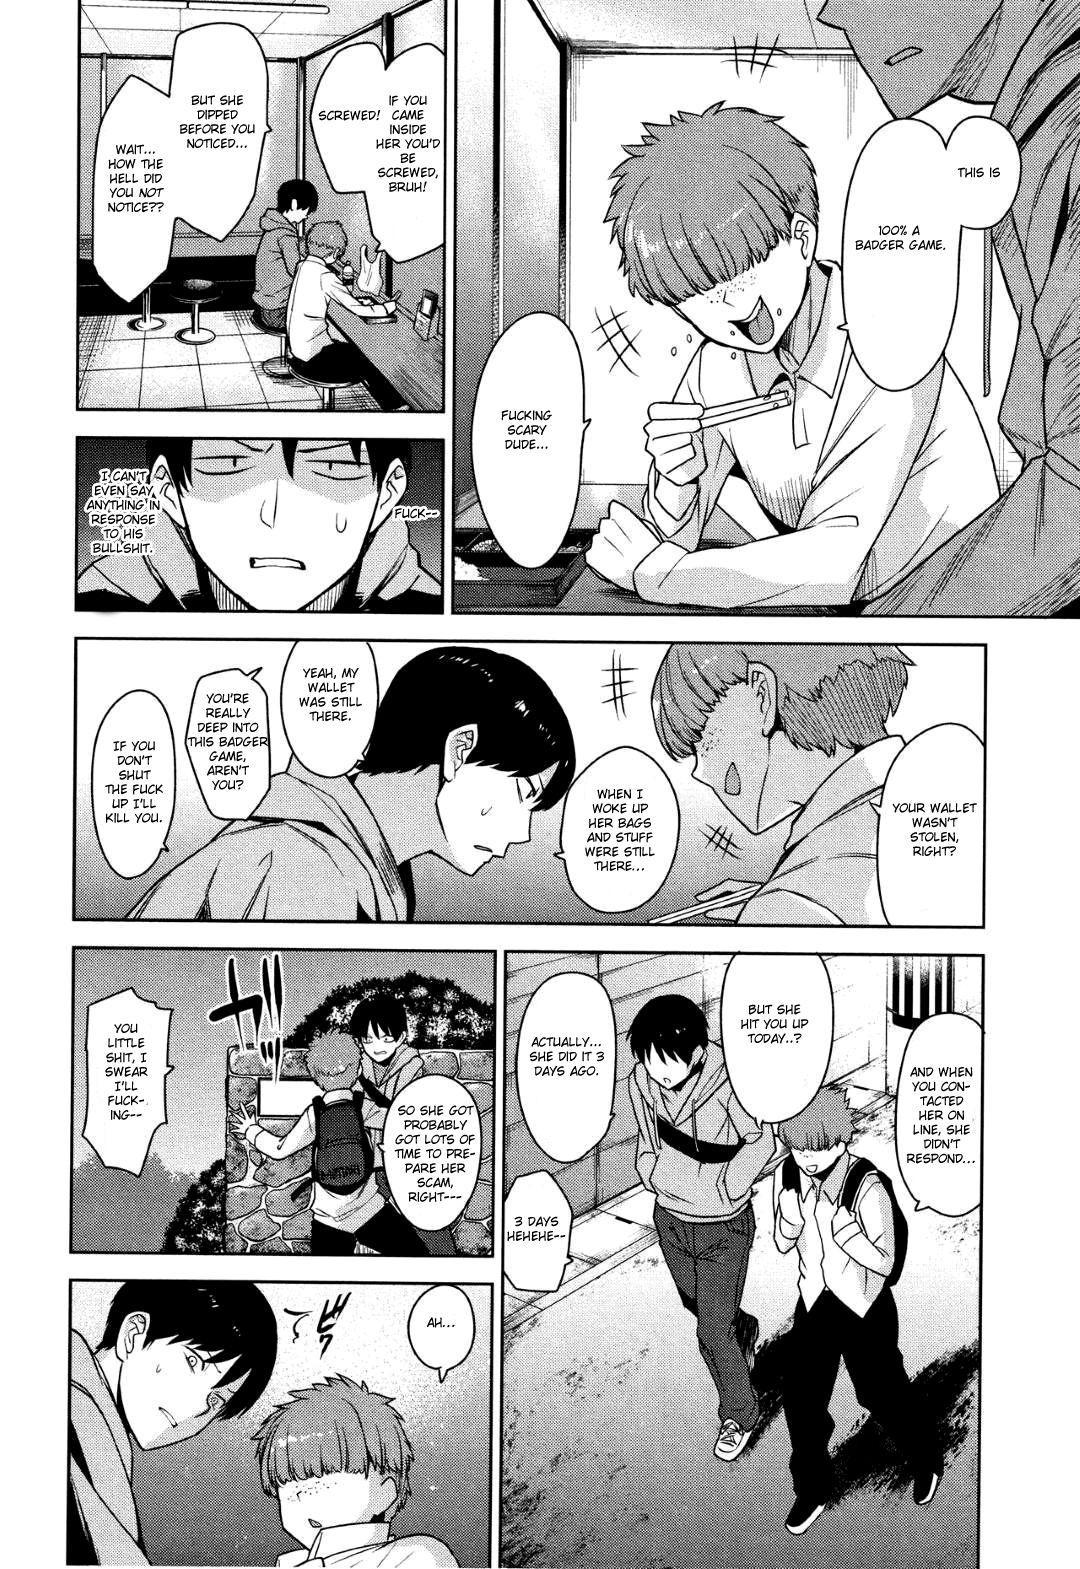 [Azuse] Kawaii Onnanoko o Tsuru Houhou - Method to catch a pretty girl Ch. 1-5 [English] [GMDTranslations] 45